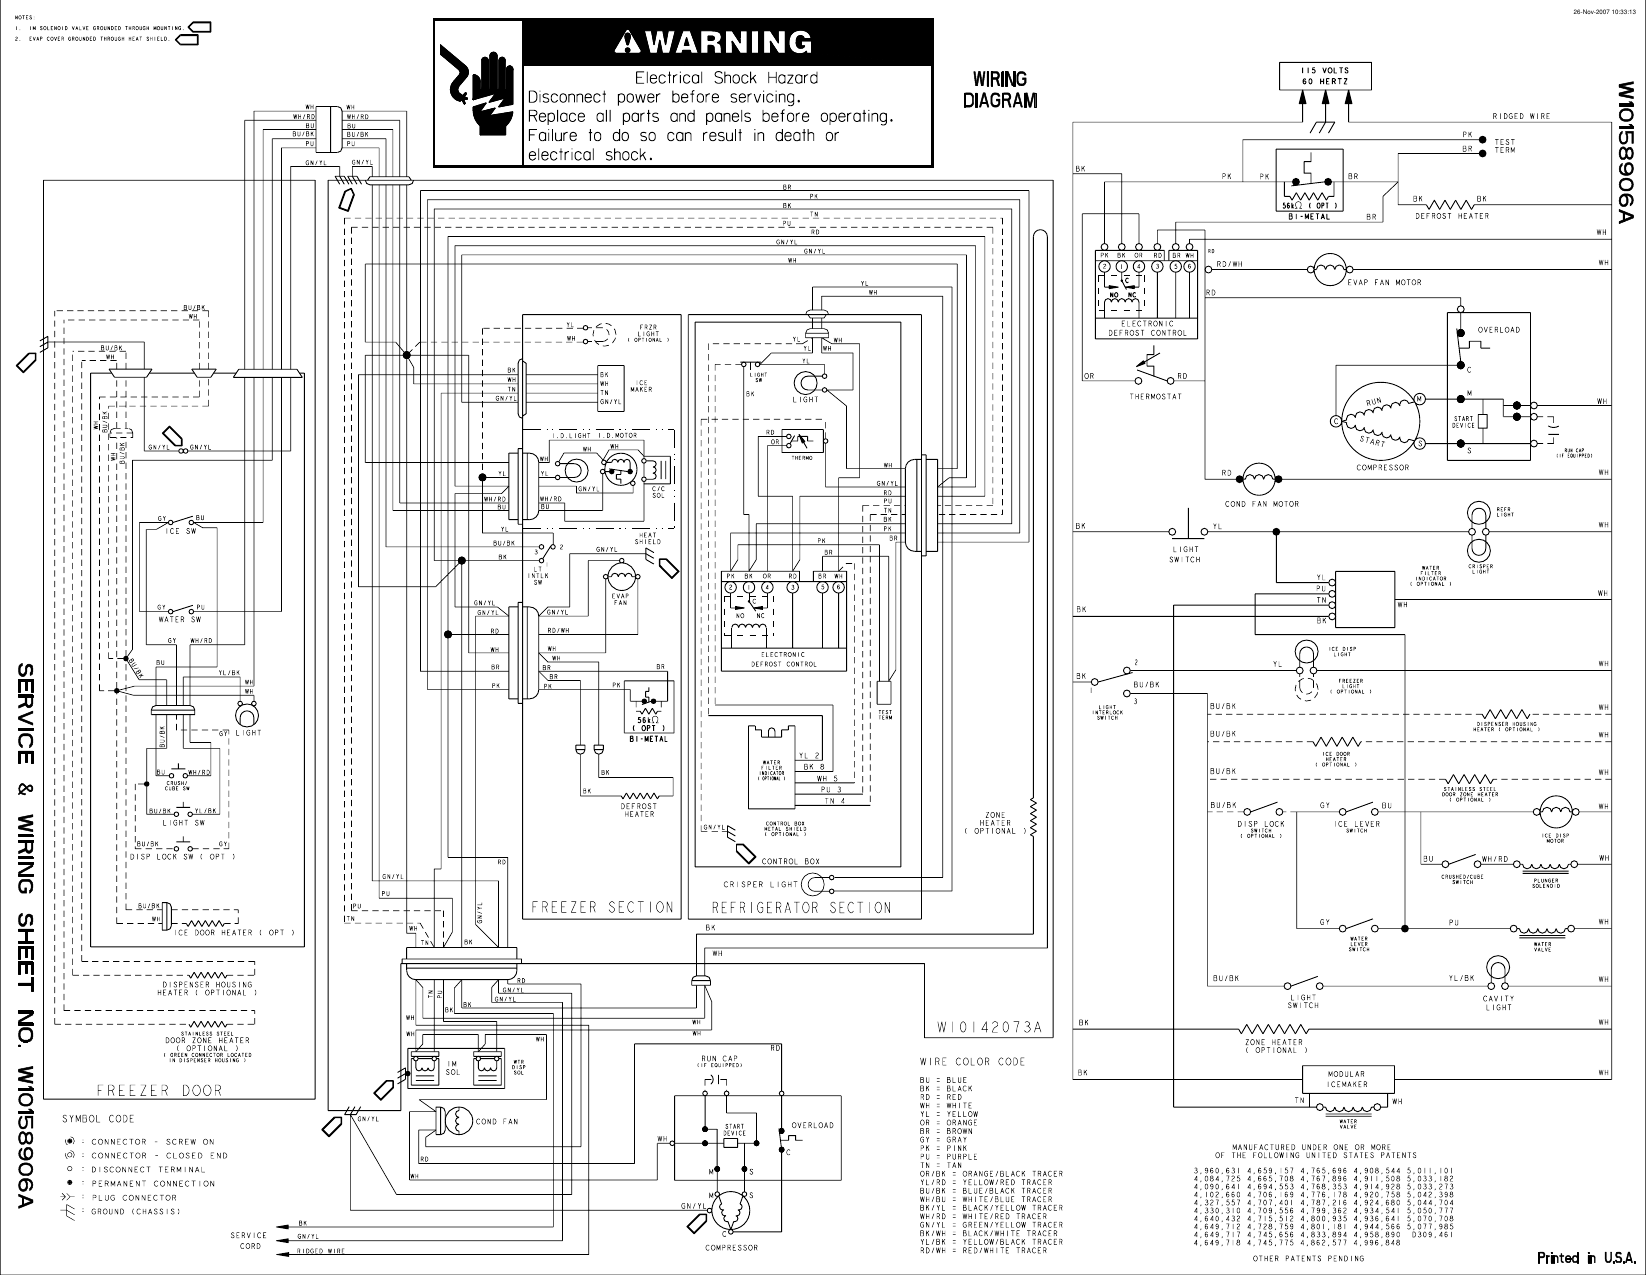 Lit Service And Wiring Sheet W10158906 Whirlpool Refrig Ed2kvexvl01